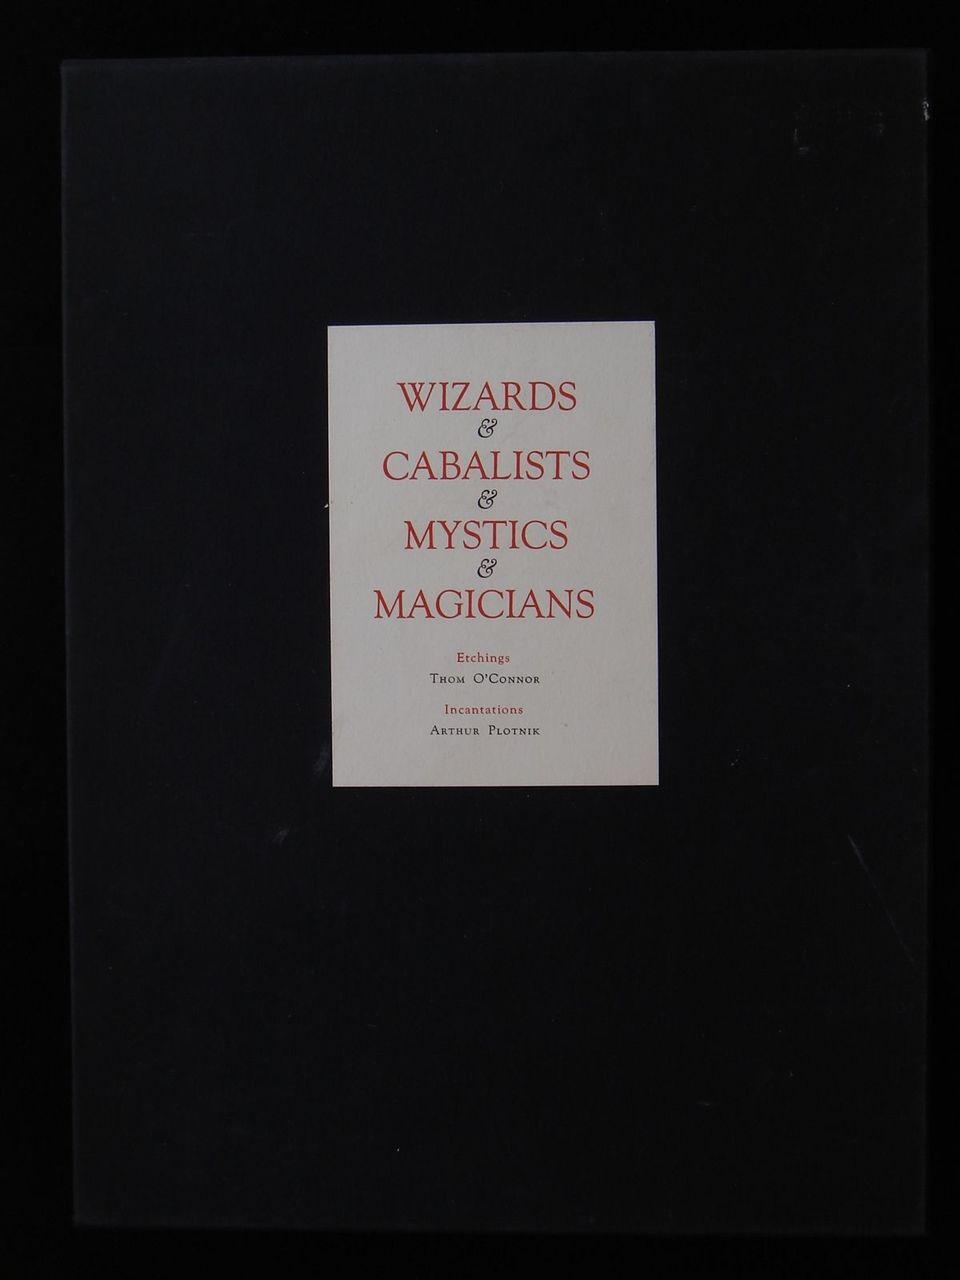 Wizards & Cabalists & Mystics & Magicians Etchings Arthur Plotnik Thom O'Conner